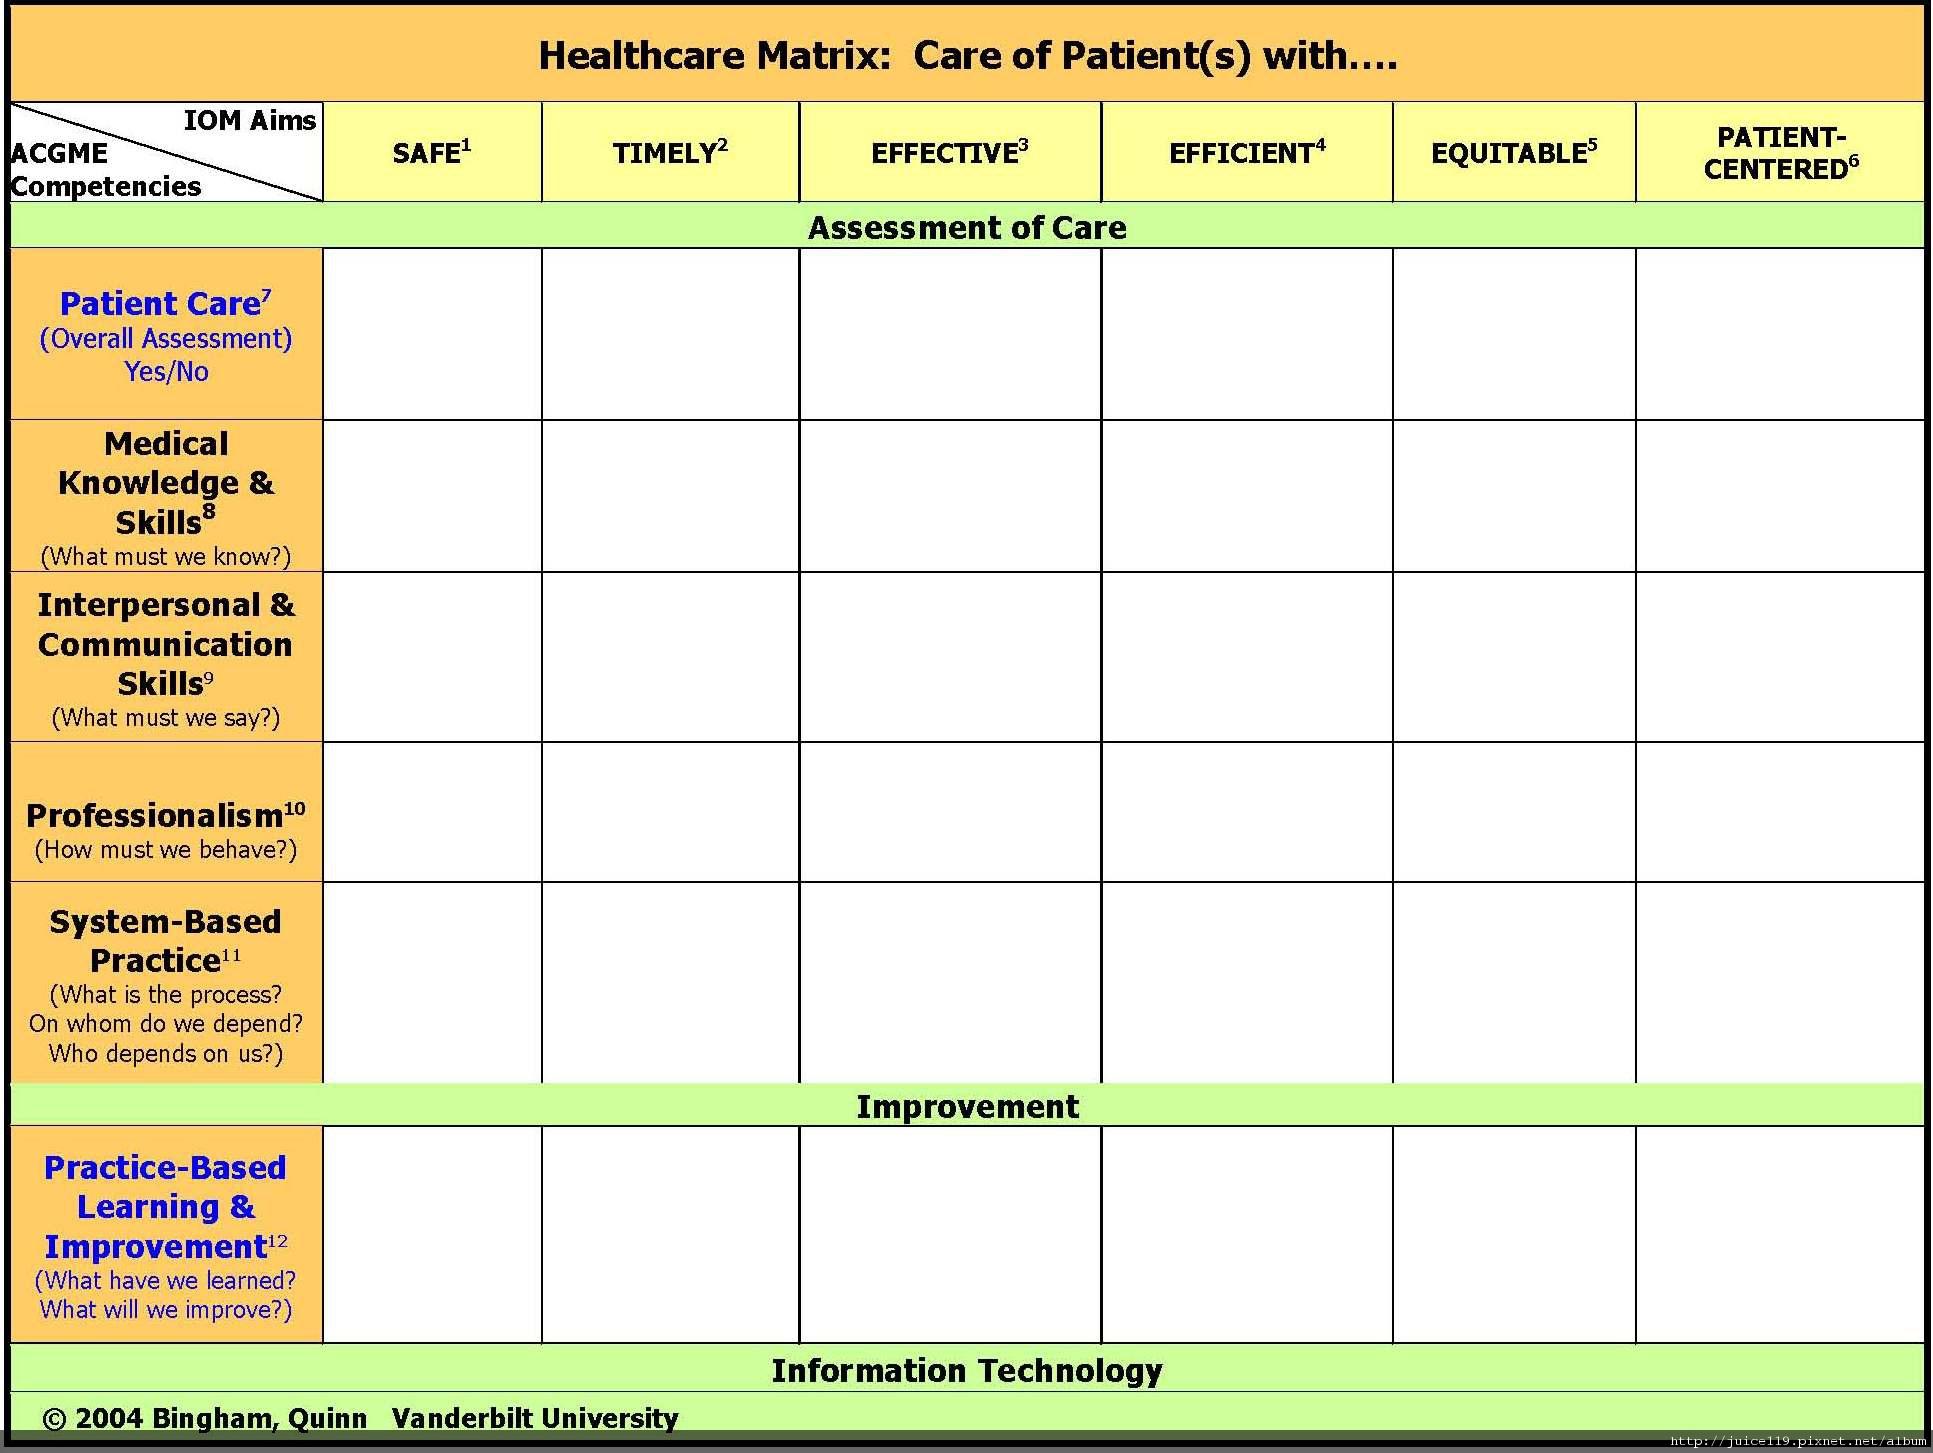 PatientHealthCareMatrix_頁面_1.jpg